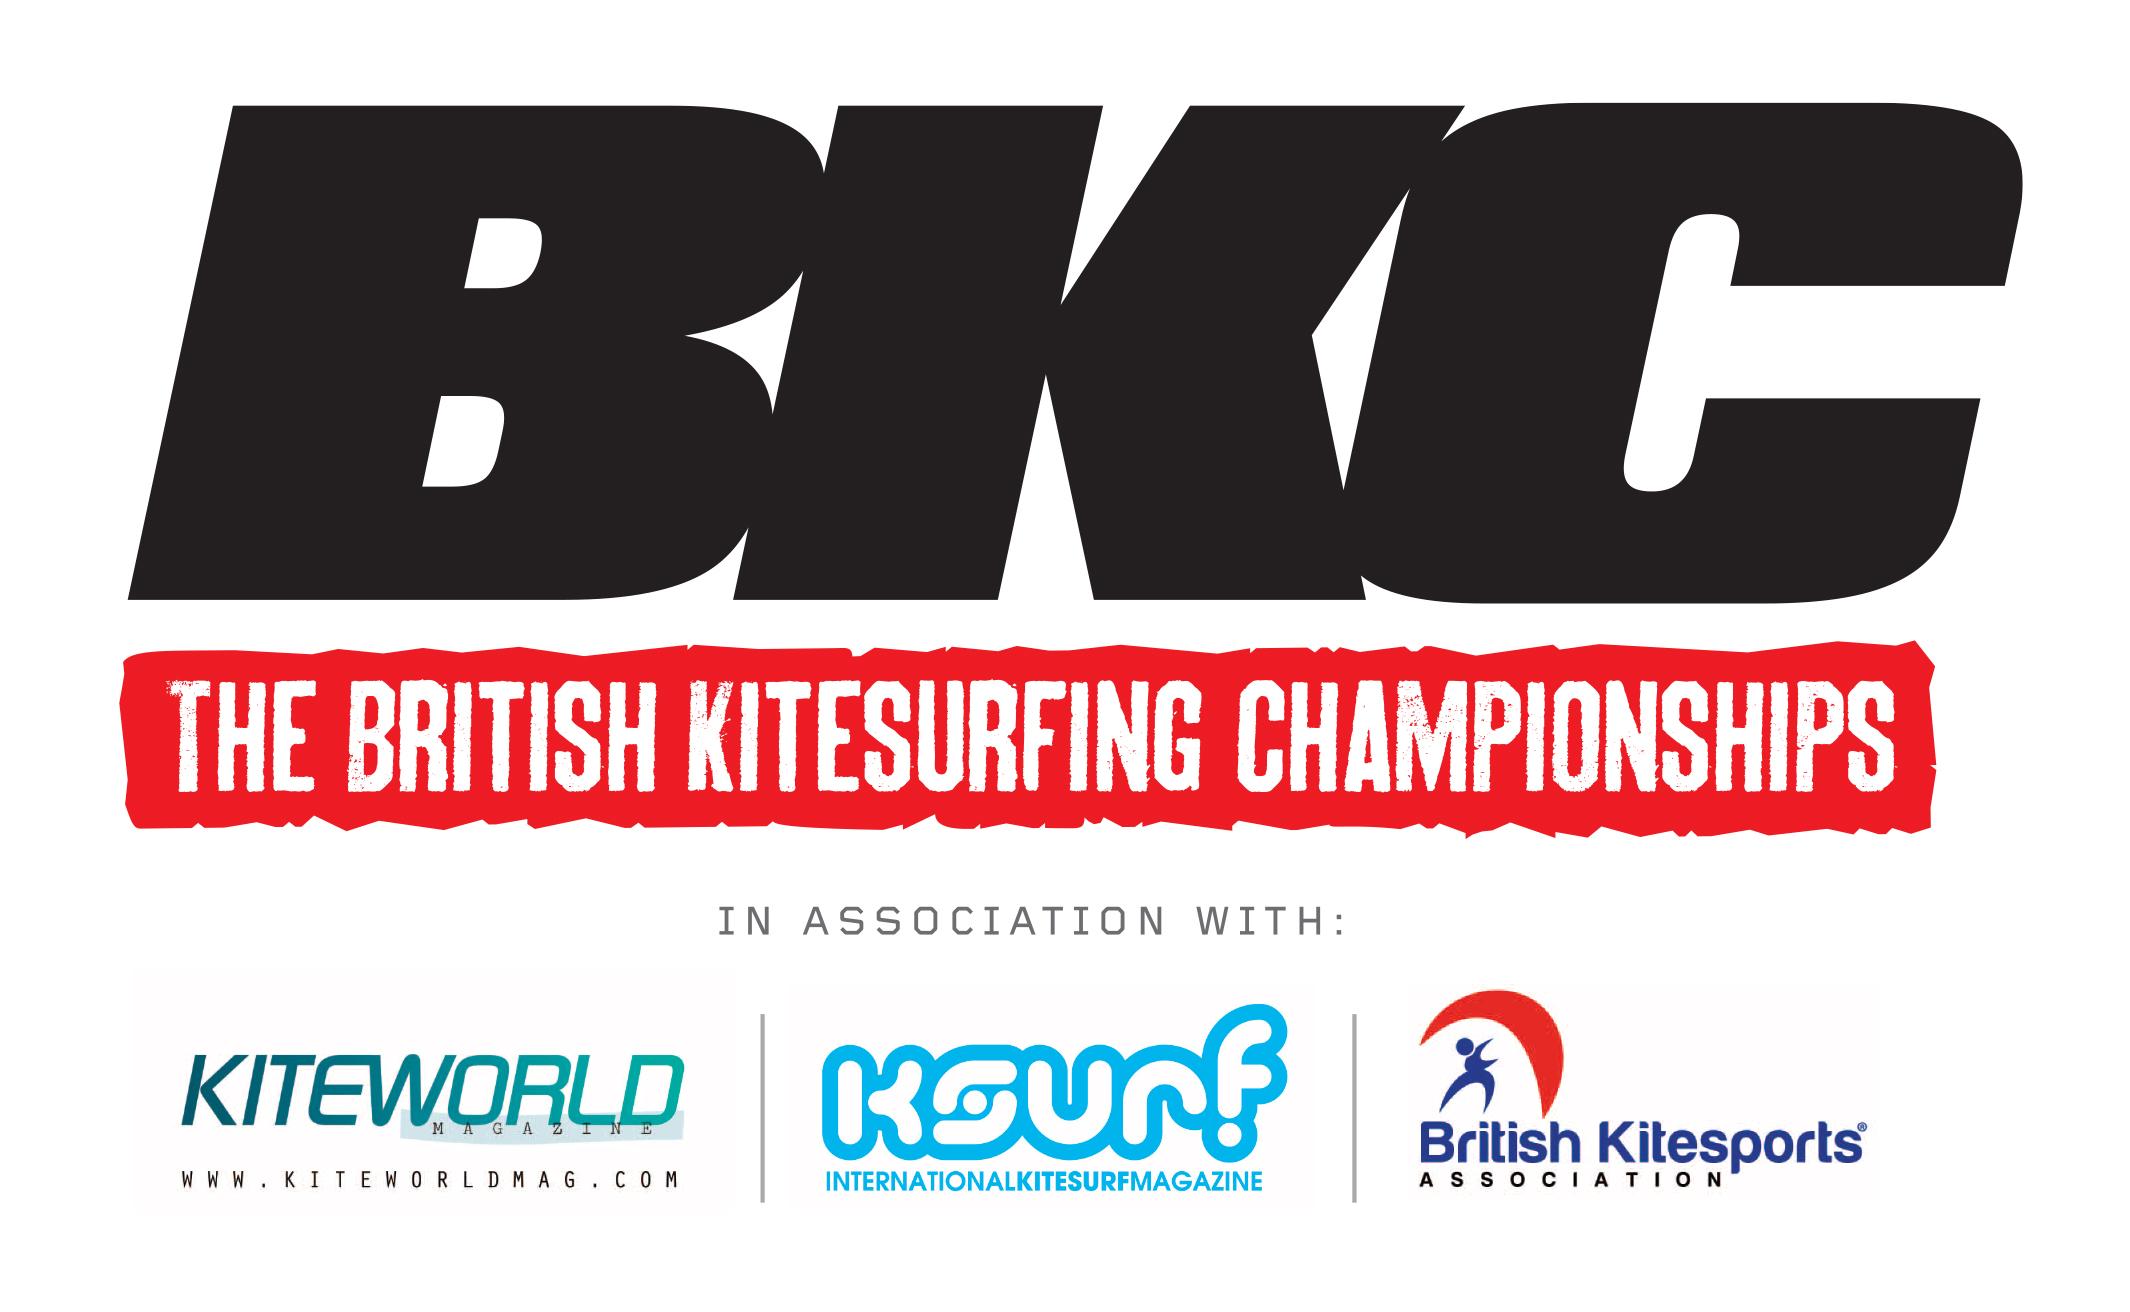 BKC-Logos-In Assoc